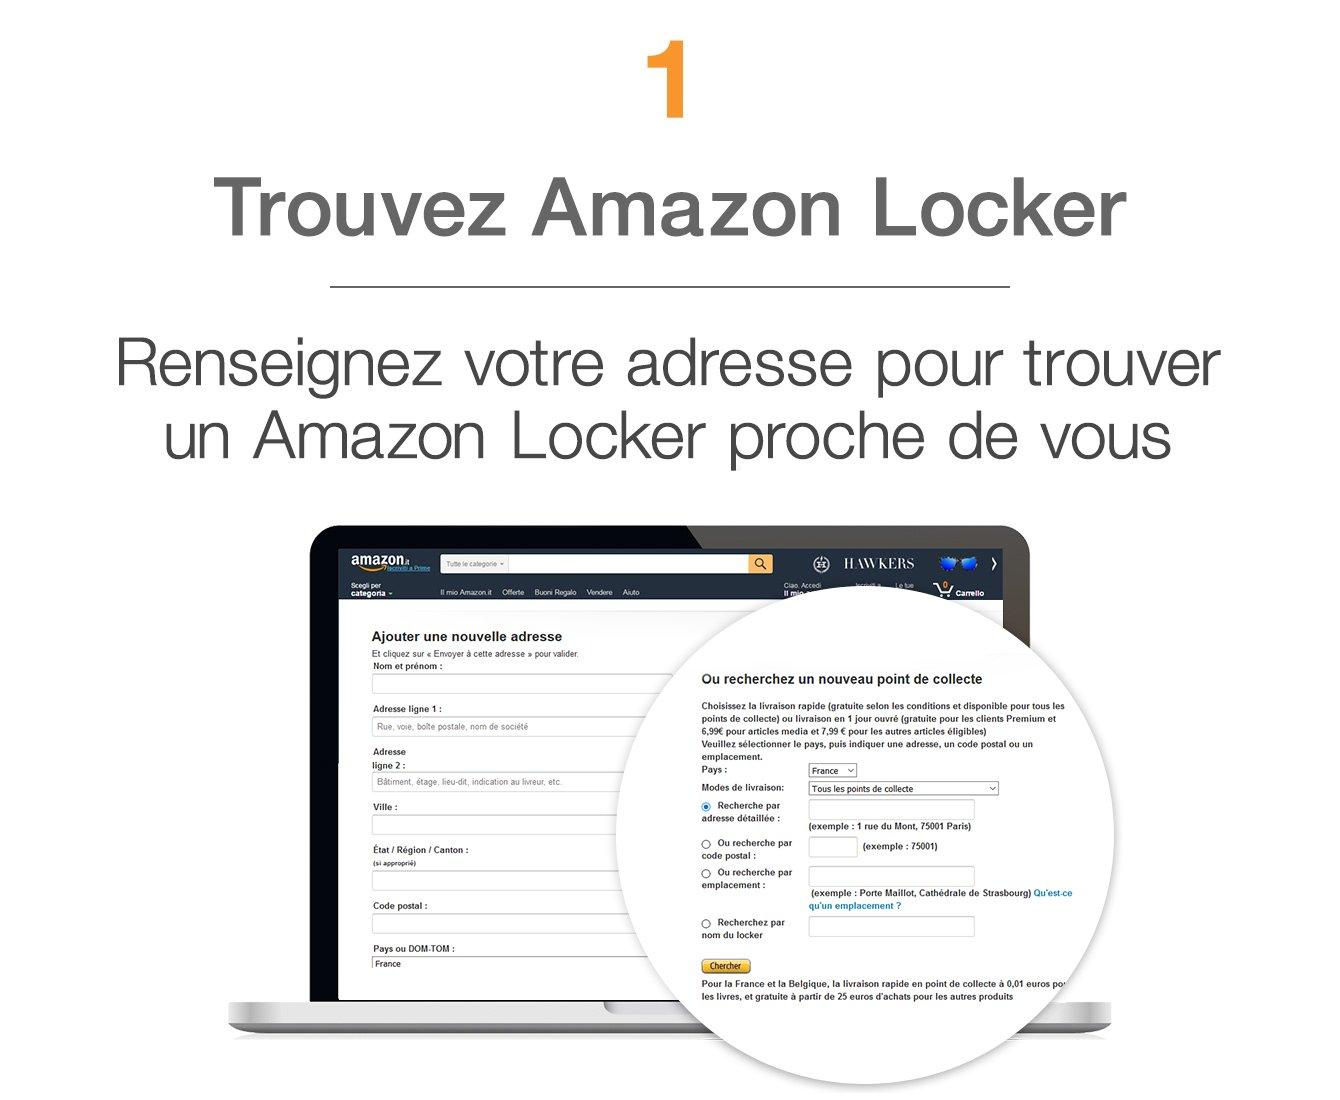 Heure livraison relais colis good division with daxon for Trouver hotel proche adresse